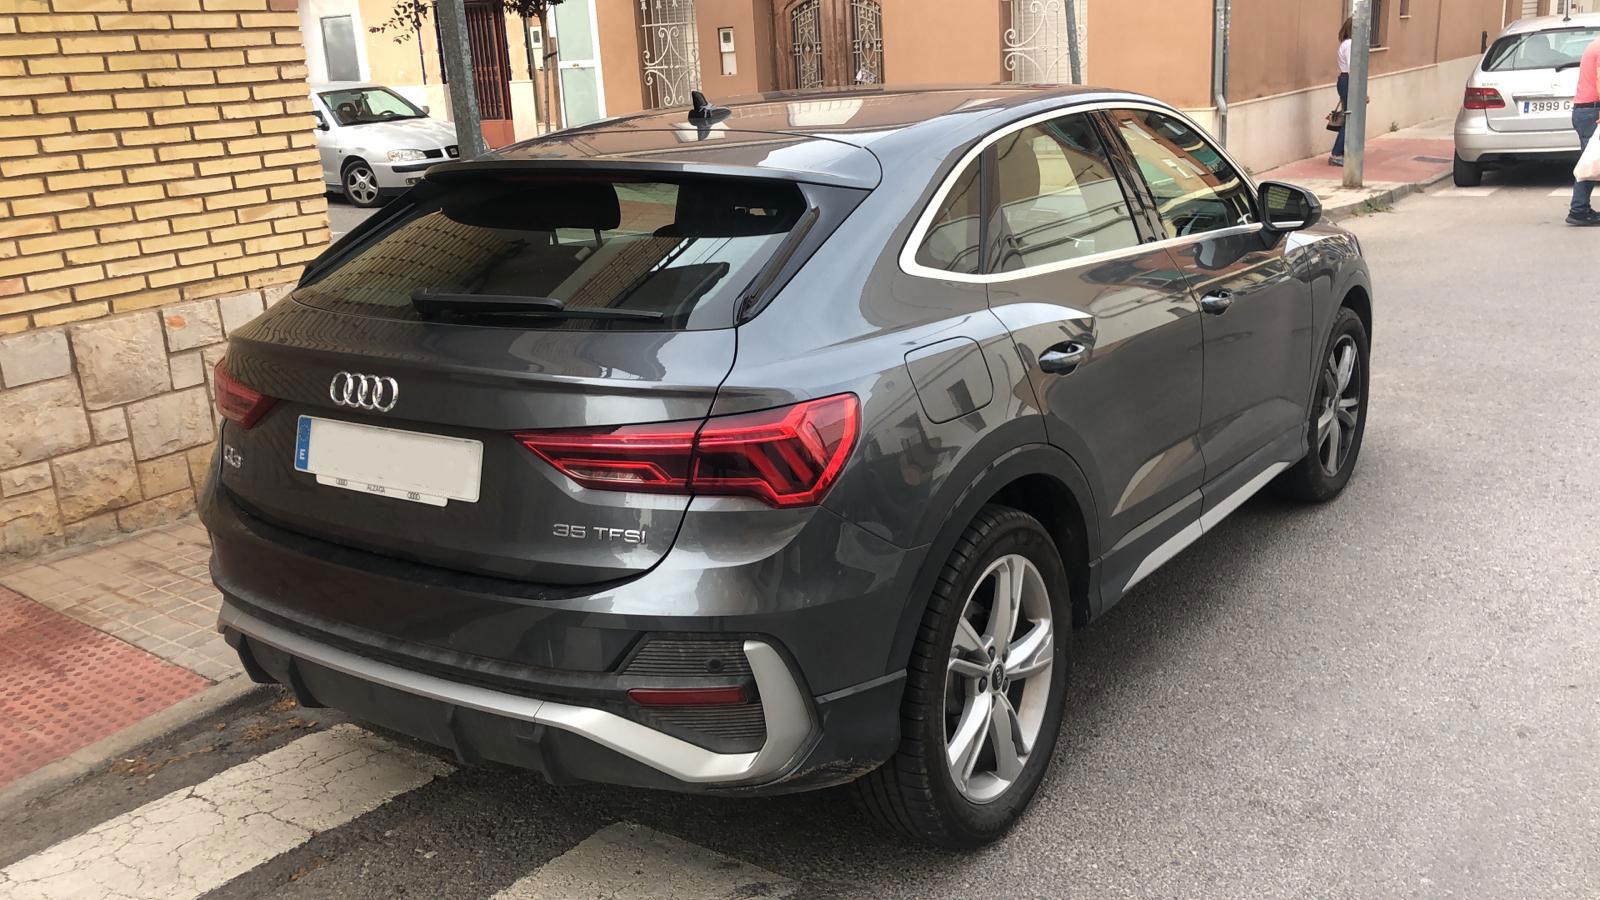 Audi-Q3-Sportback-TSFI-Rental-Ibiza-3